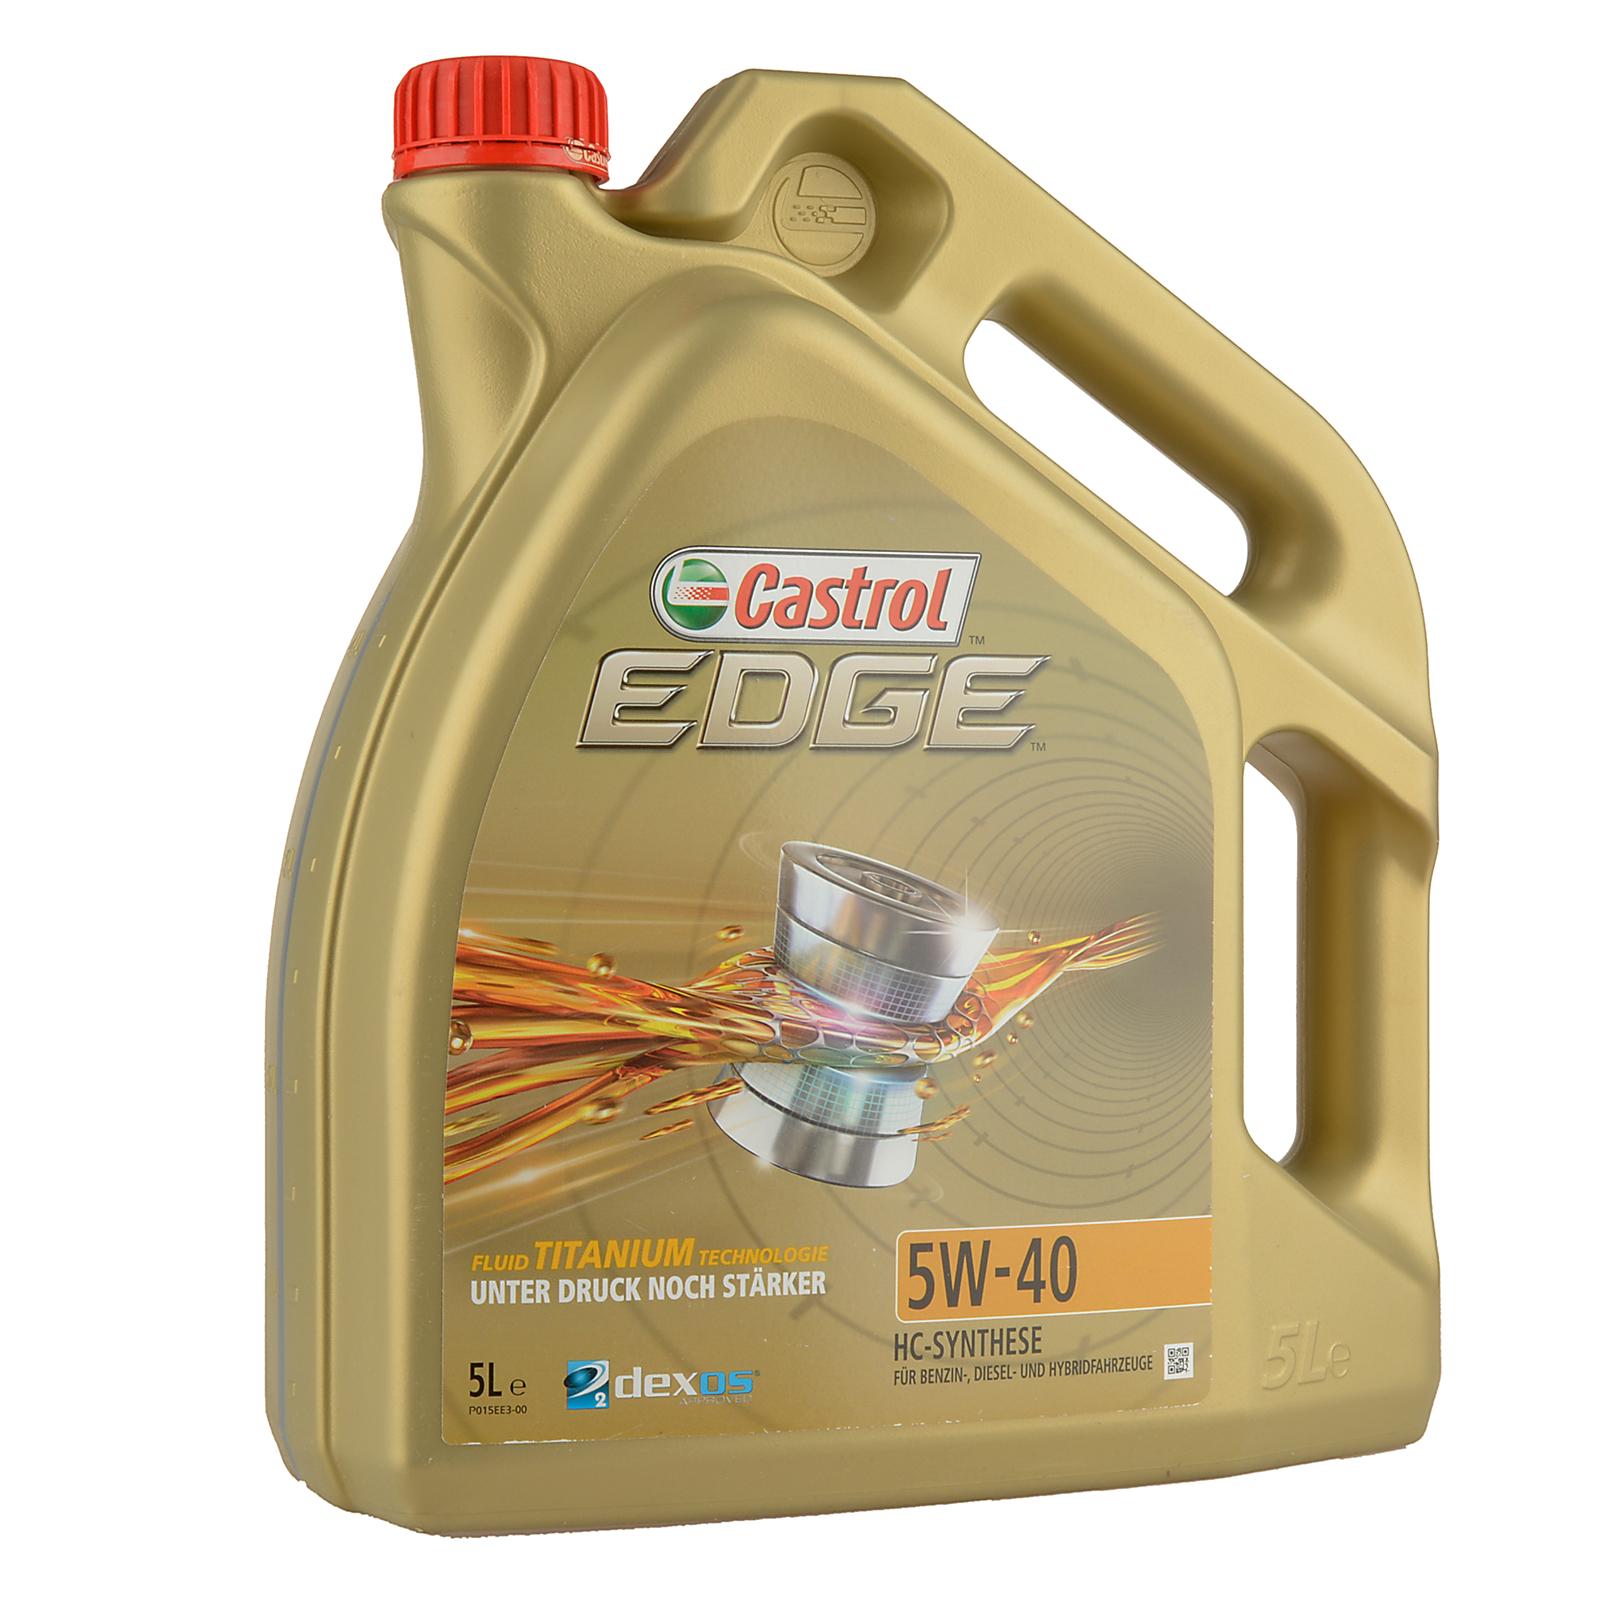 Castrol EDGE Titanium FST 5W-40 - 5 Liter – Bild 1